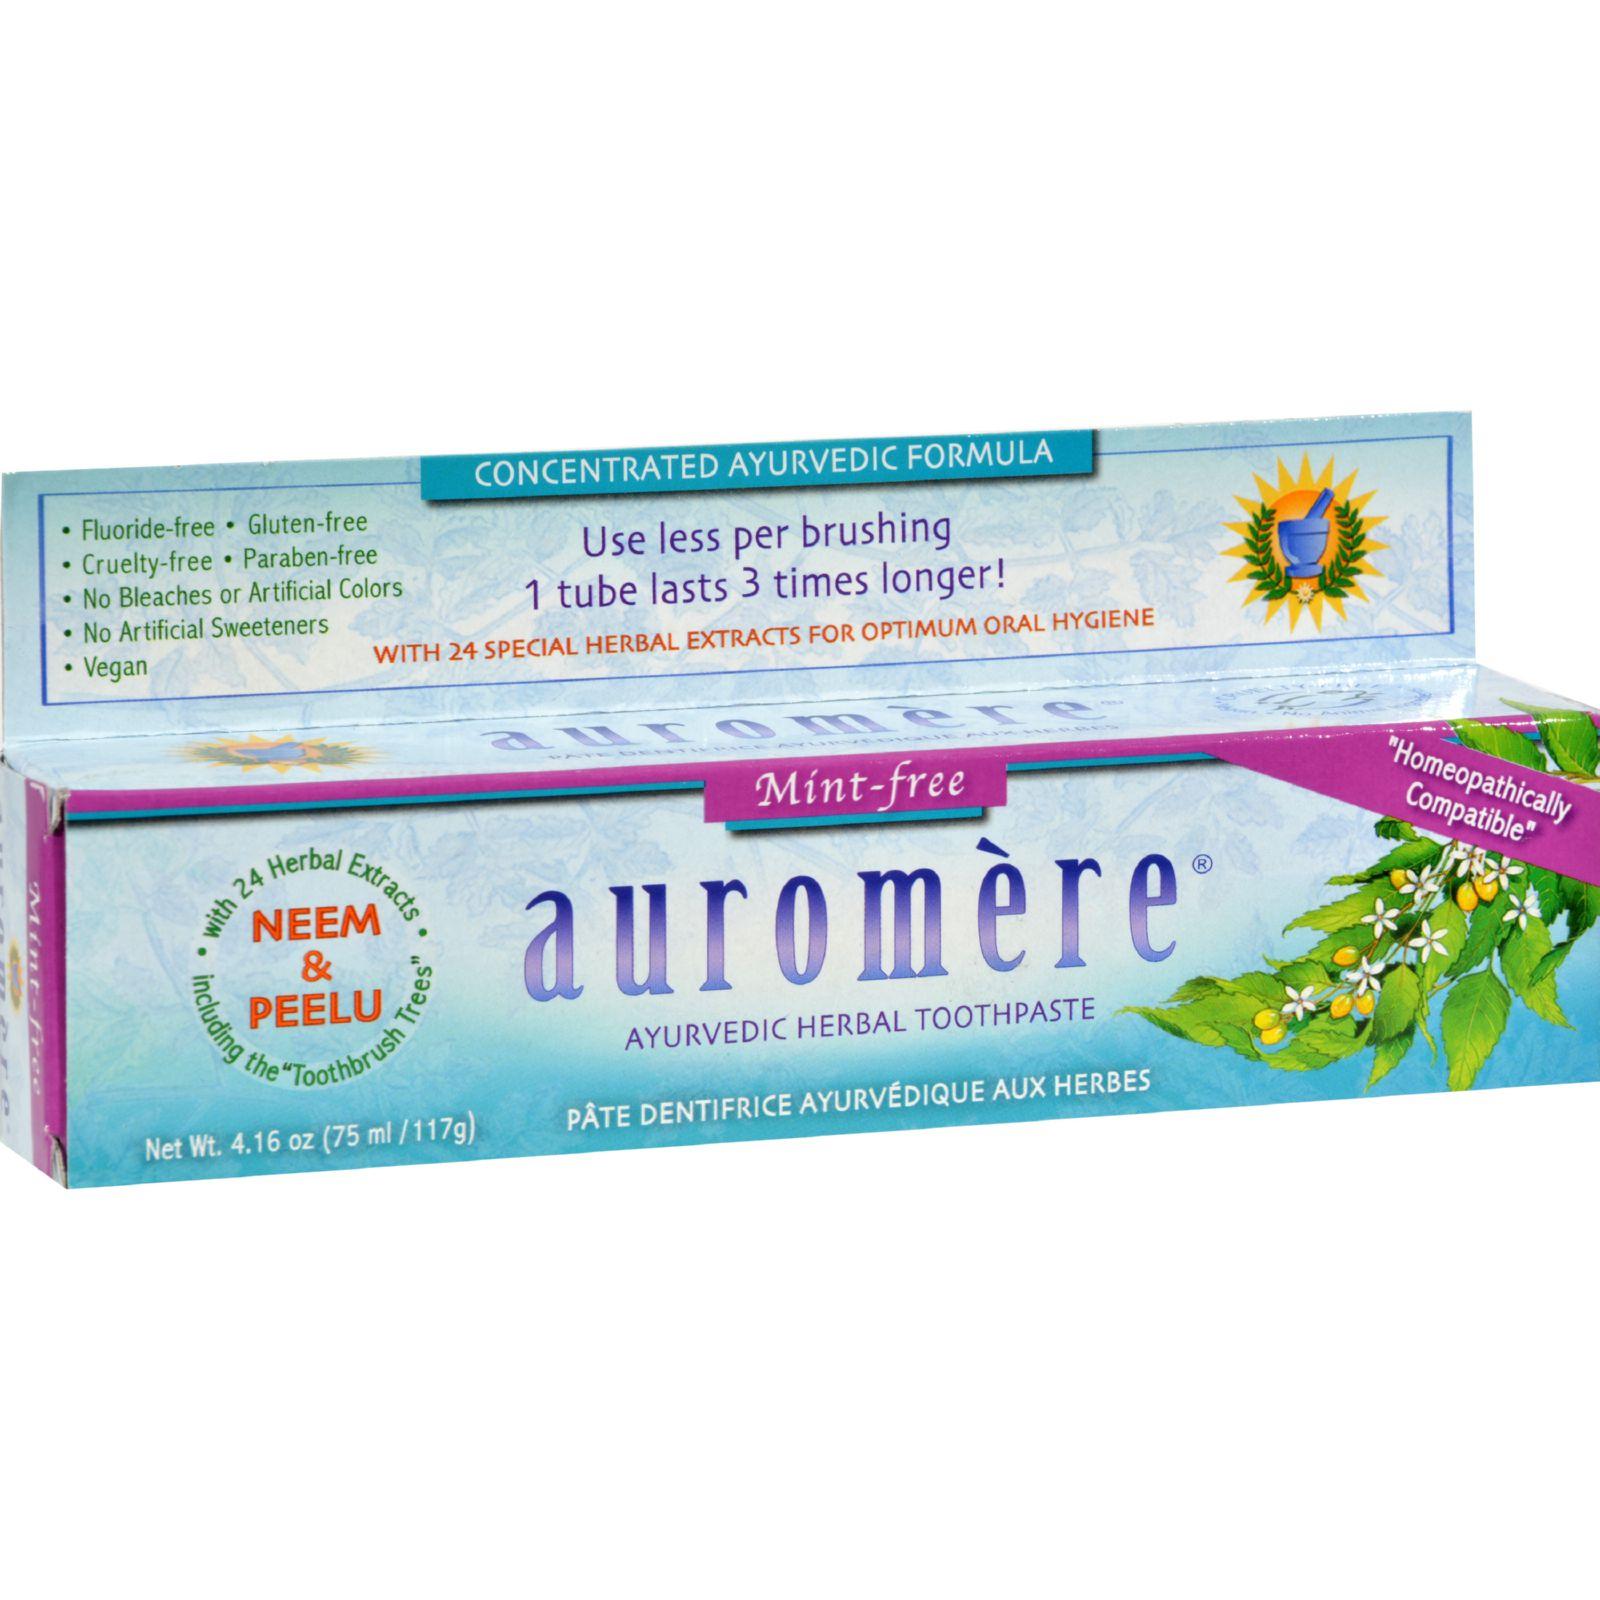 Auromere Toothpaste - Ayurvedic Herbal - Hmpthc Mnt Fr - 4.16 oz - Case of 12